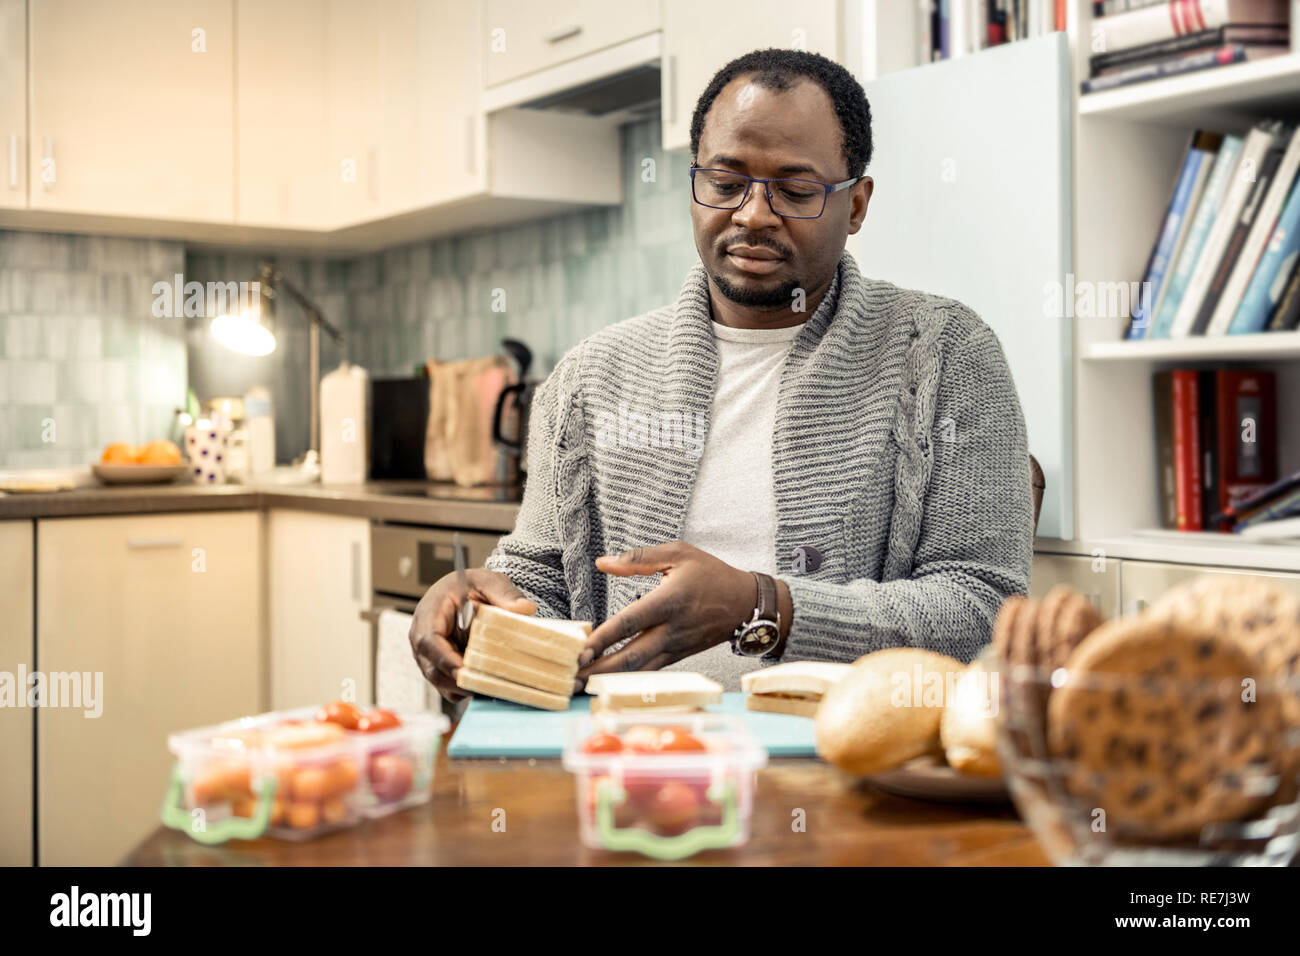 Padre bondadoso gafas cocinar sandwiches para viaje familiar Foto de stock